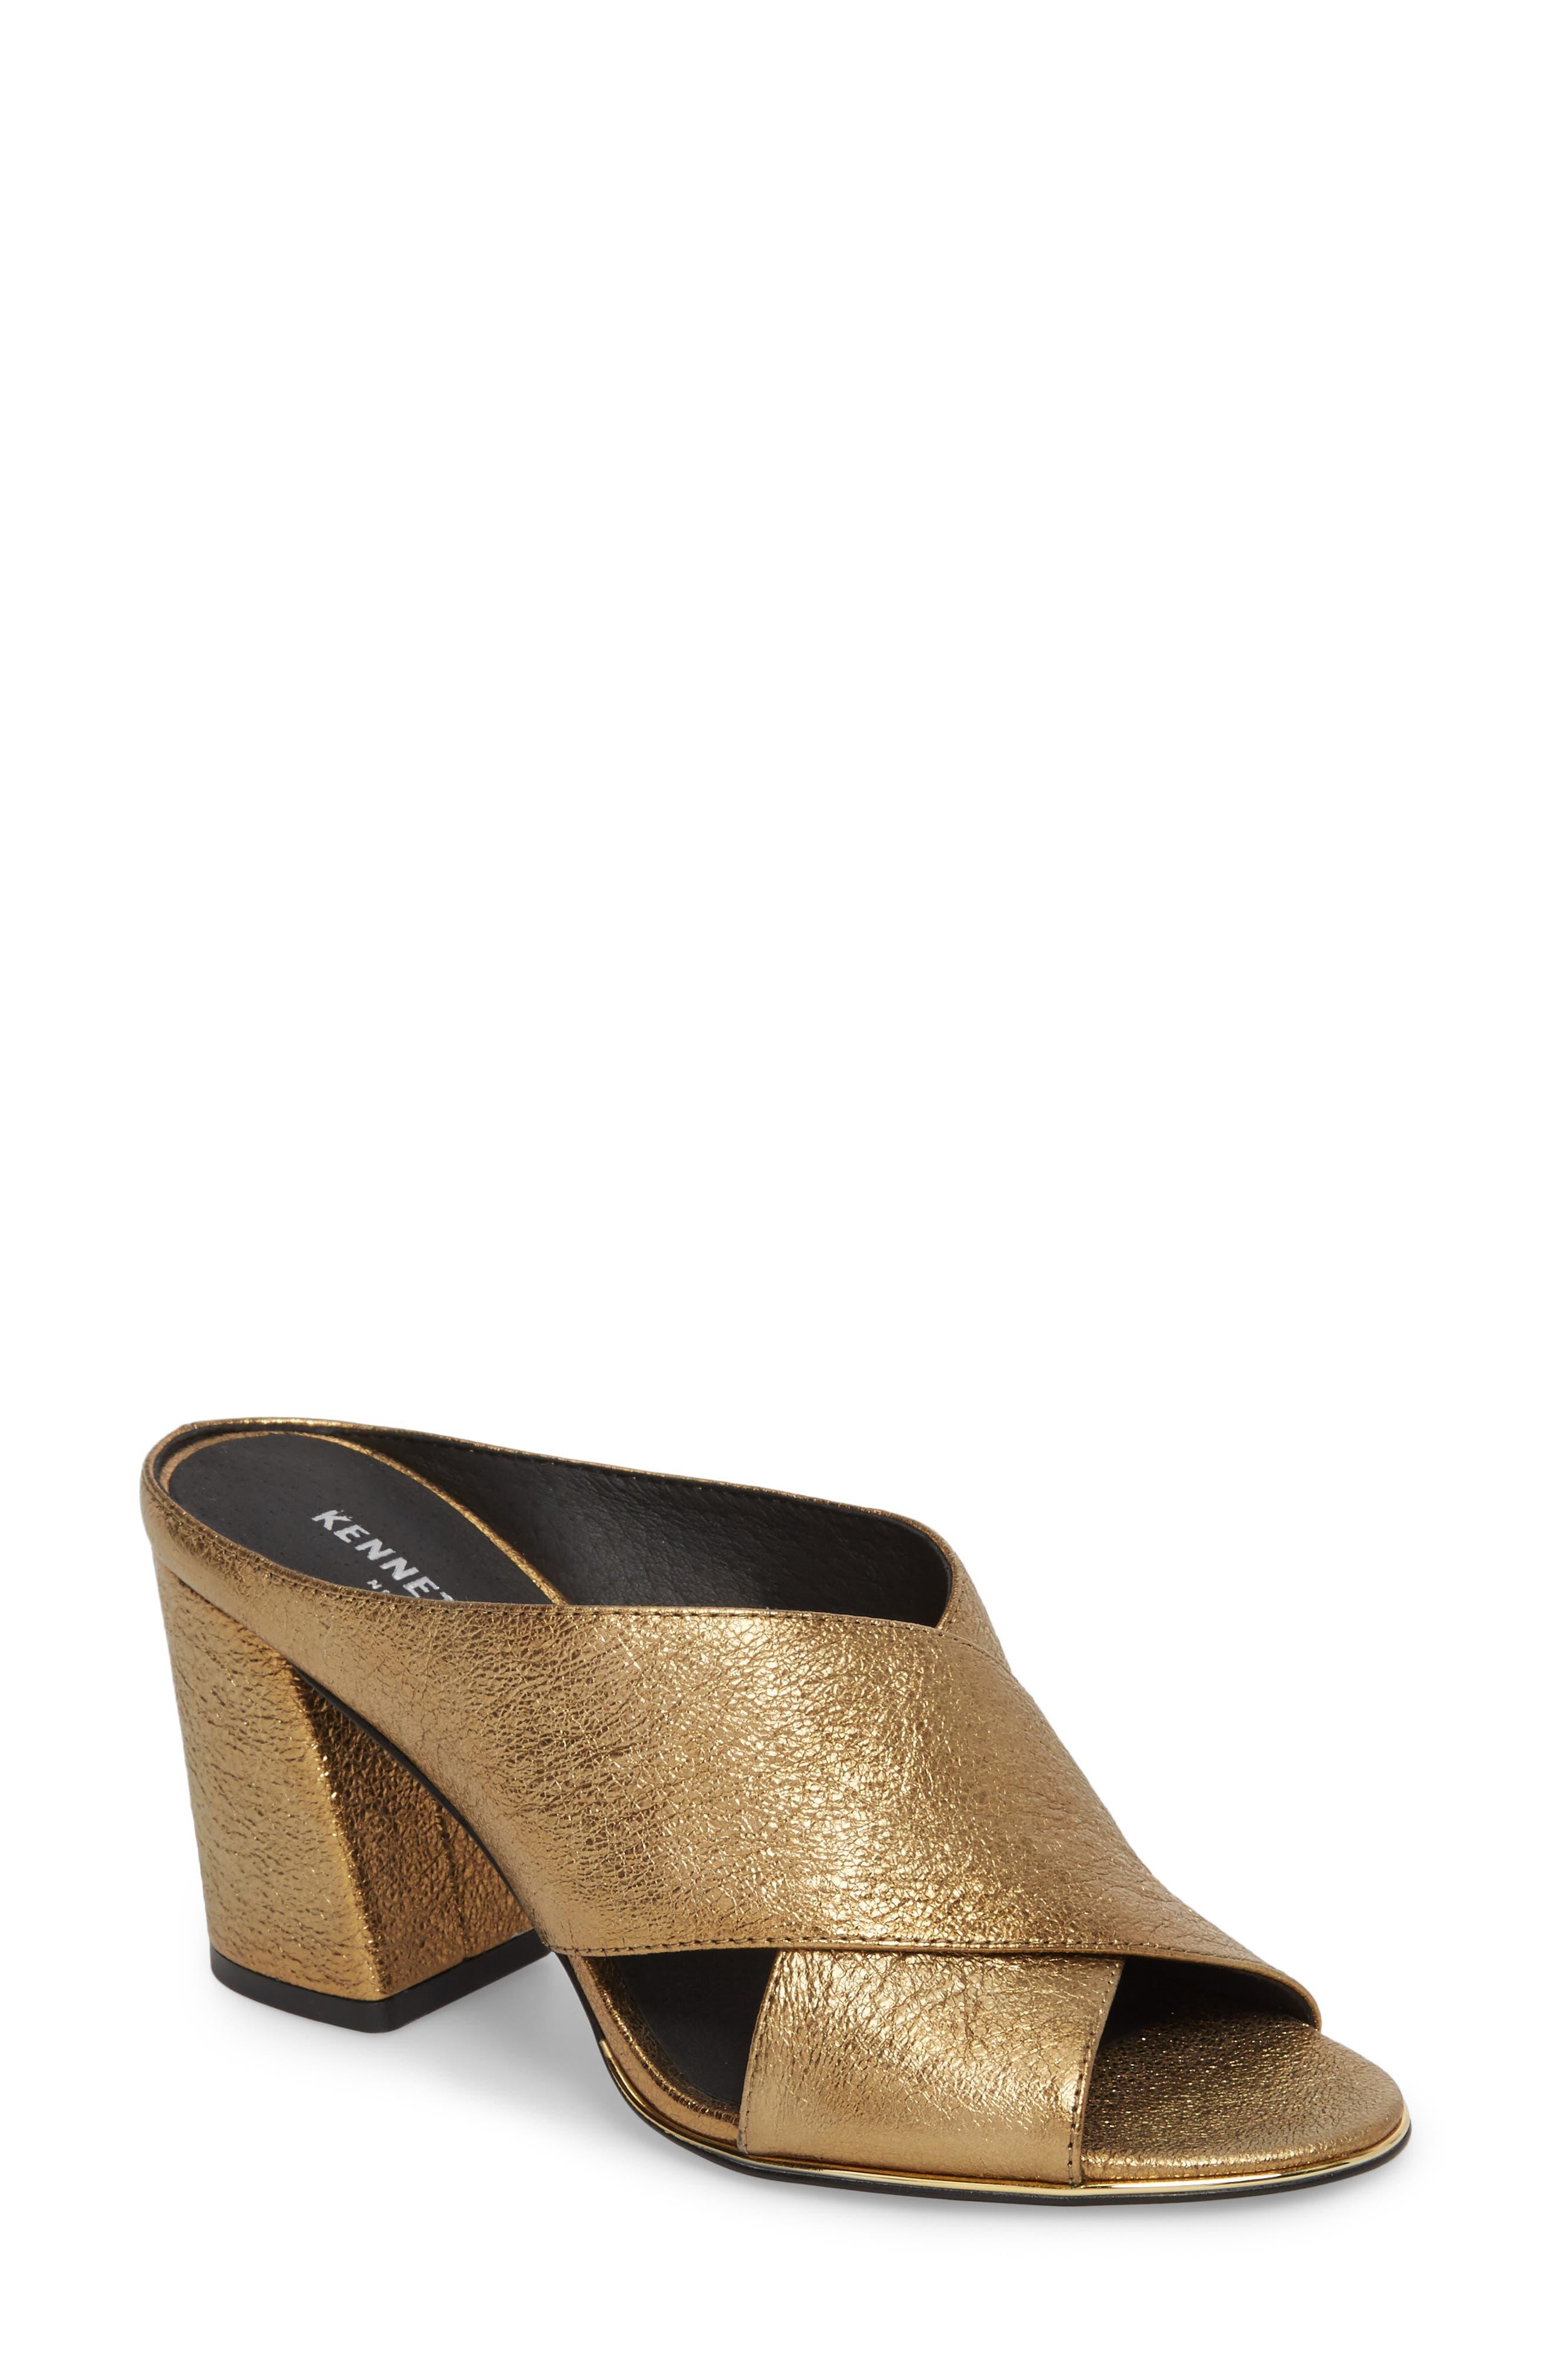 Lyra Sandal,                         Main,                         color, Gold Metallic Leather